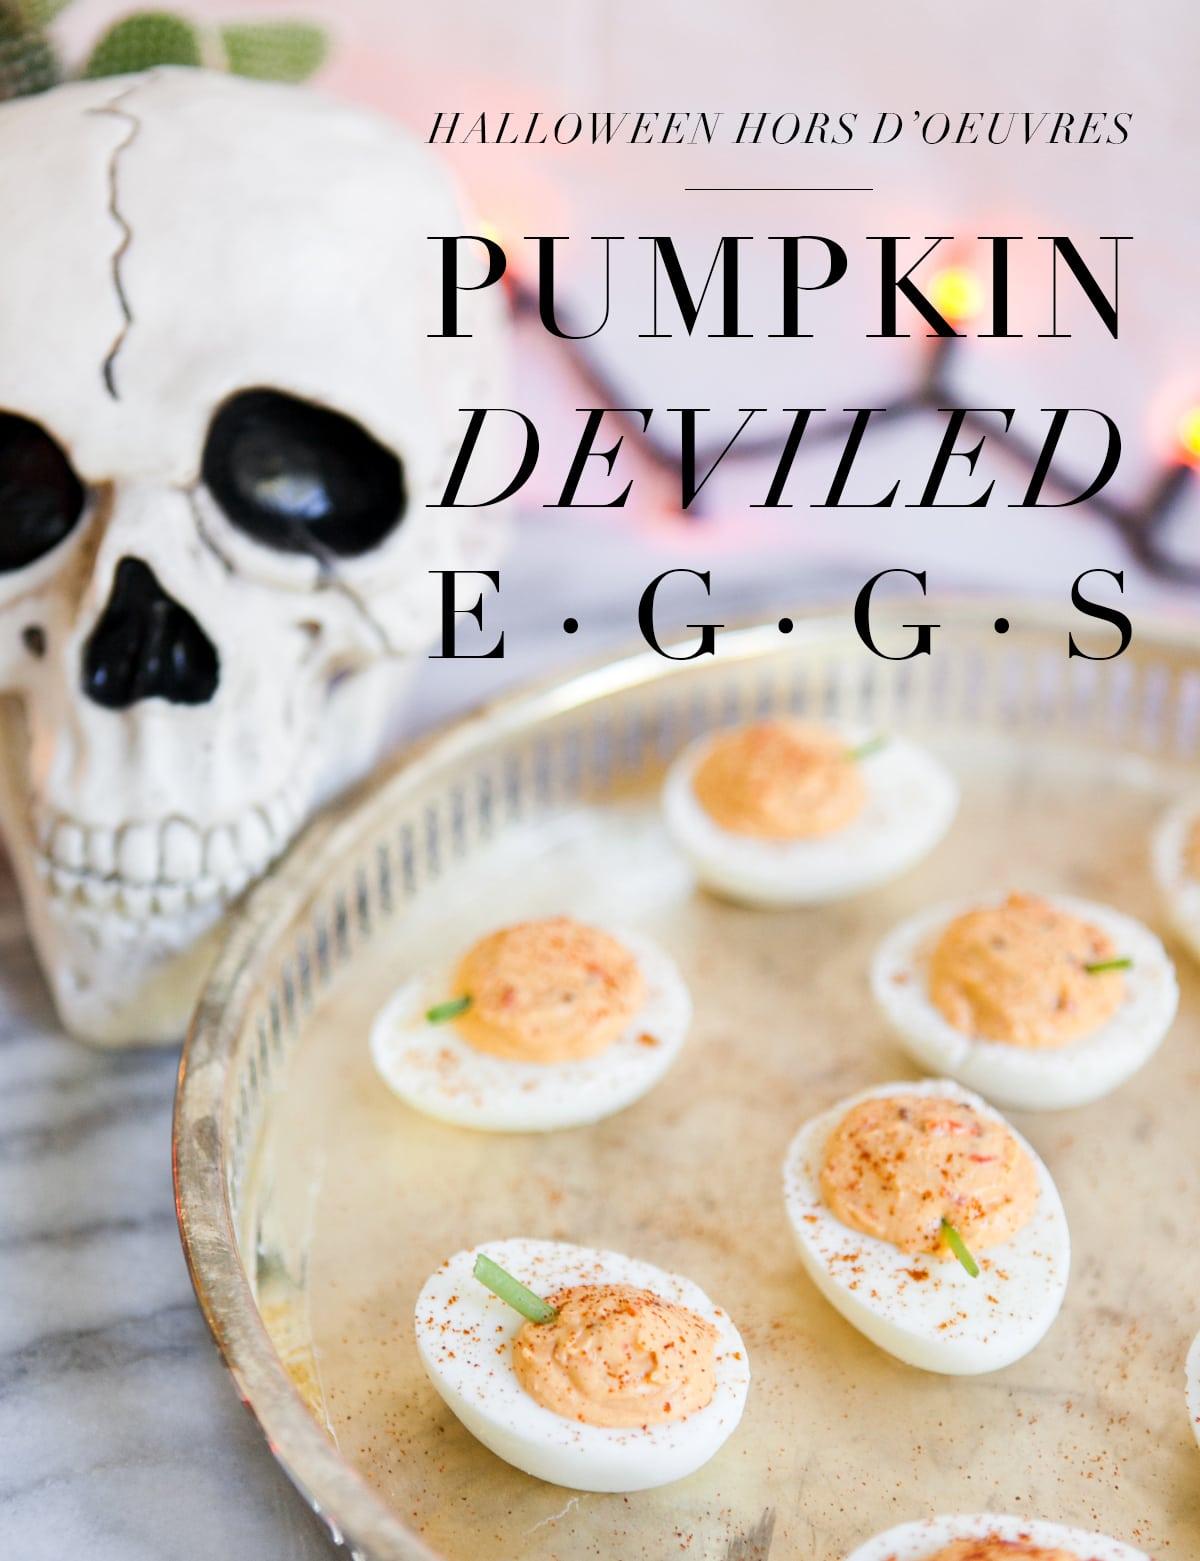 Halloween Hors D'oeuvre | Pumpkin Deviled Eggs | Quick & Easy Halloween Appetizer | Halloween Potluck | Holiday Snacks